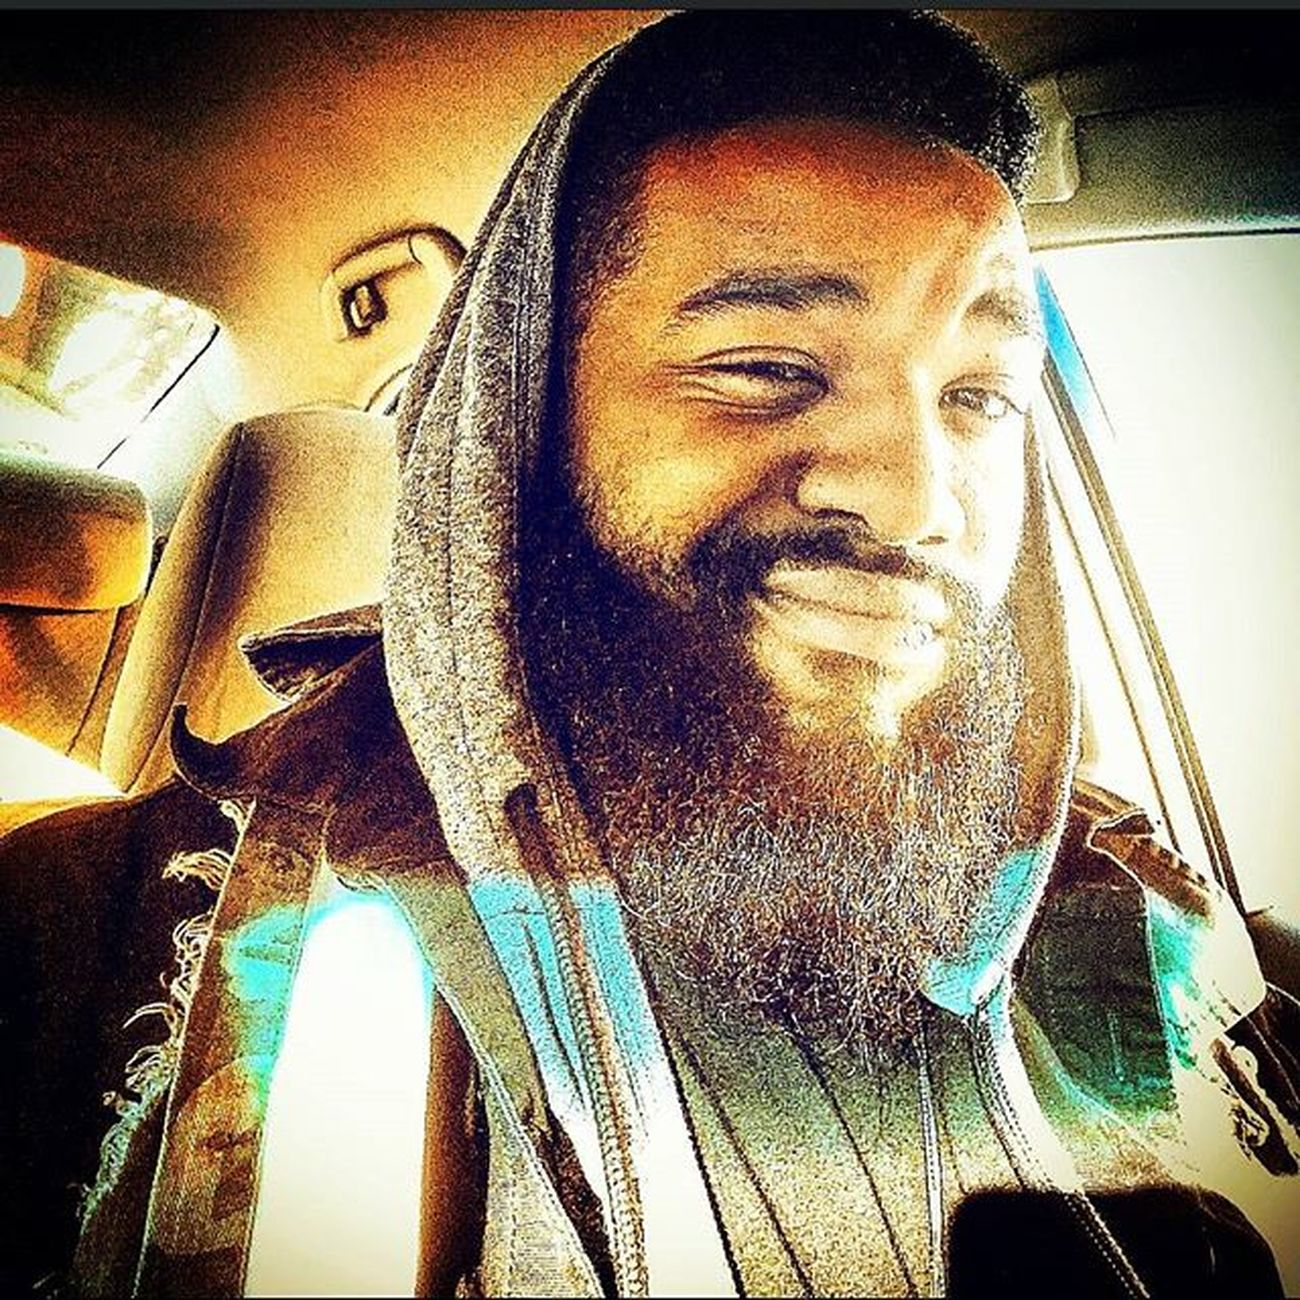 The only way to survive eternity, is to be able to appreciate each moment. We don't beat the reaper by living longer, we beat the reaper by living well and living fully. Enjoy your day and your life. Smile and BE! 😏🙌✌💯 Hipower Blackgod Blackavatar Blackking Knowledgegod Wisdom Blackscholar Wakeup YoungGiftedAndBlack Beardedgod Beardthefuckup Blackandbearded Beardnation Beardsofcolor Beardgang Beardsareforever Beardup Beardgangtakeover Queencity Tagusyourbeards Beardedvillians Beardedbrotherhood Beardsofinstagram TheBeardJoint Beardedbrosclub beardlifestyle blackmanwithstyle blackmenwithbeards beardedgentlemen